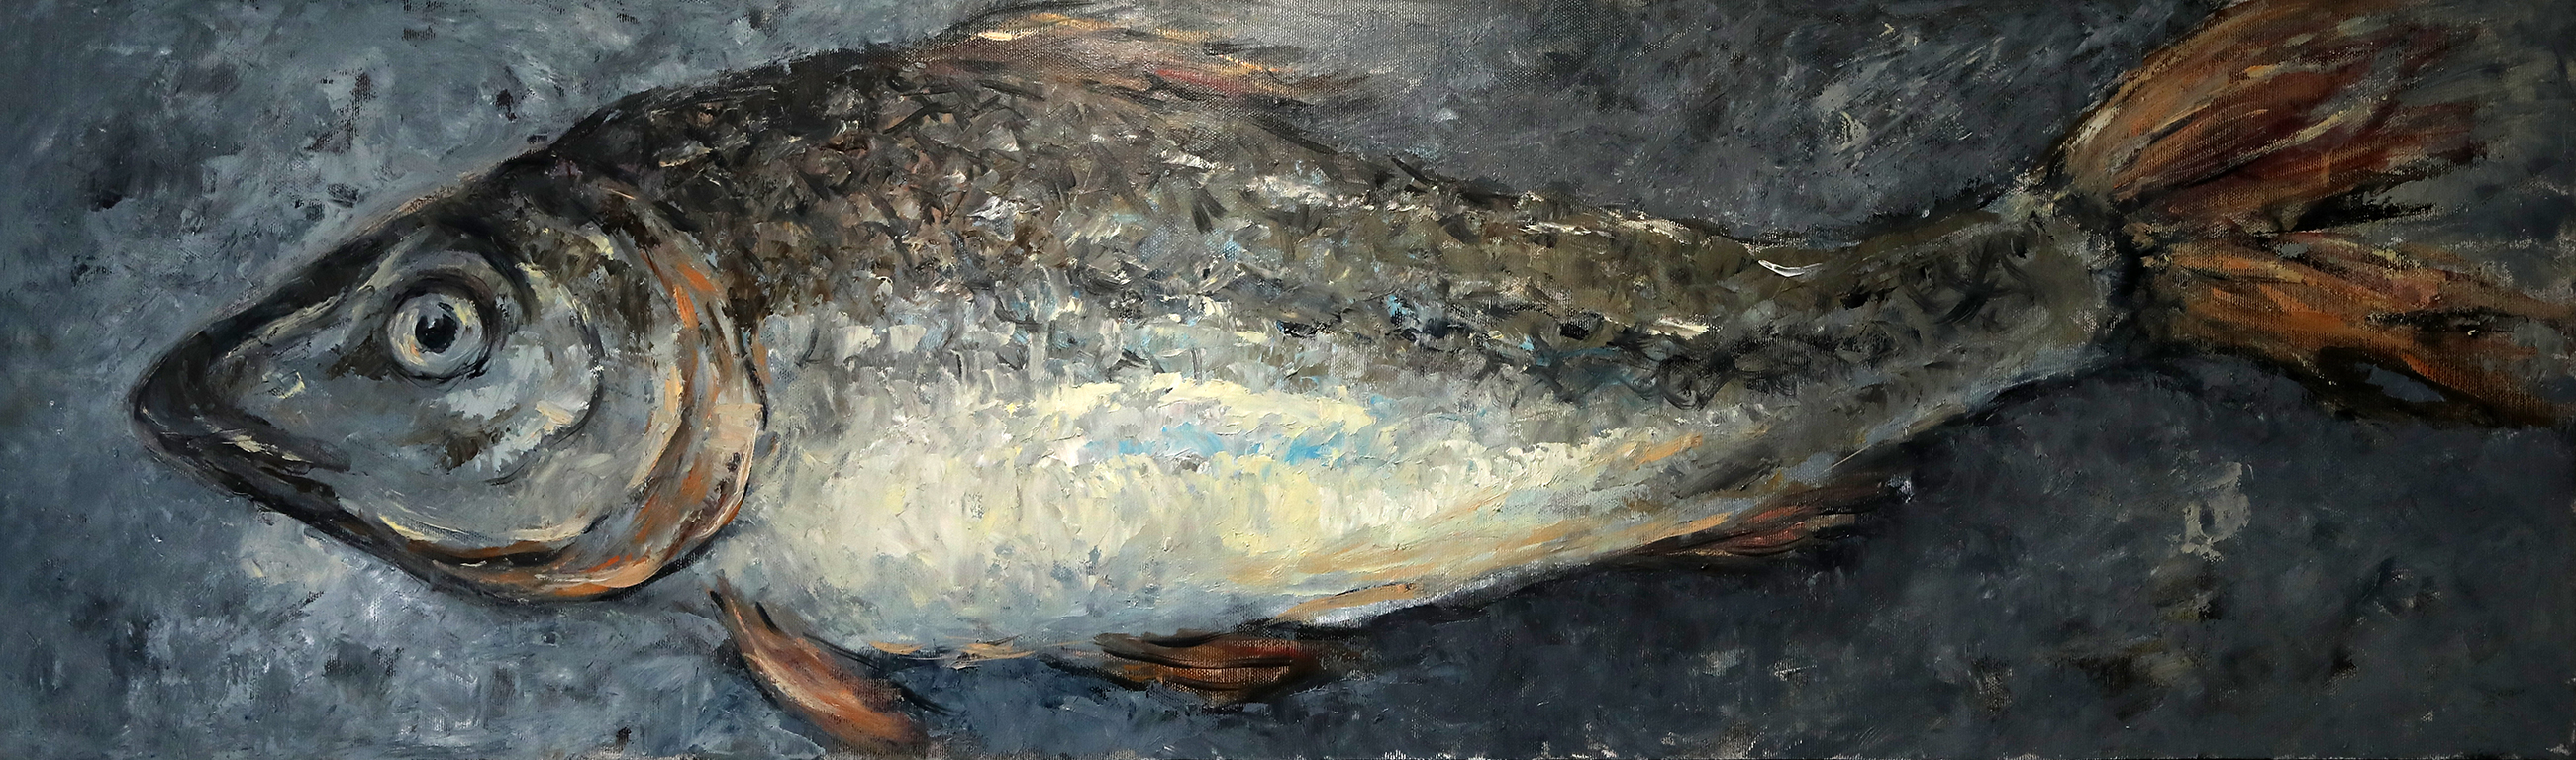 <p>Риба 1</p>